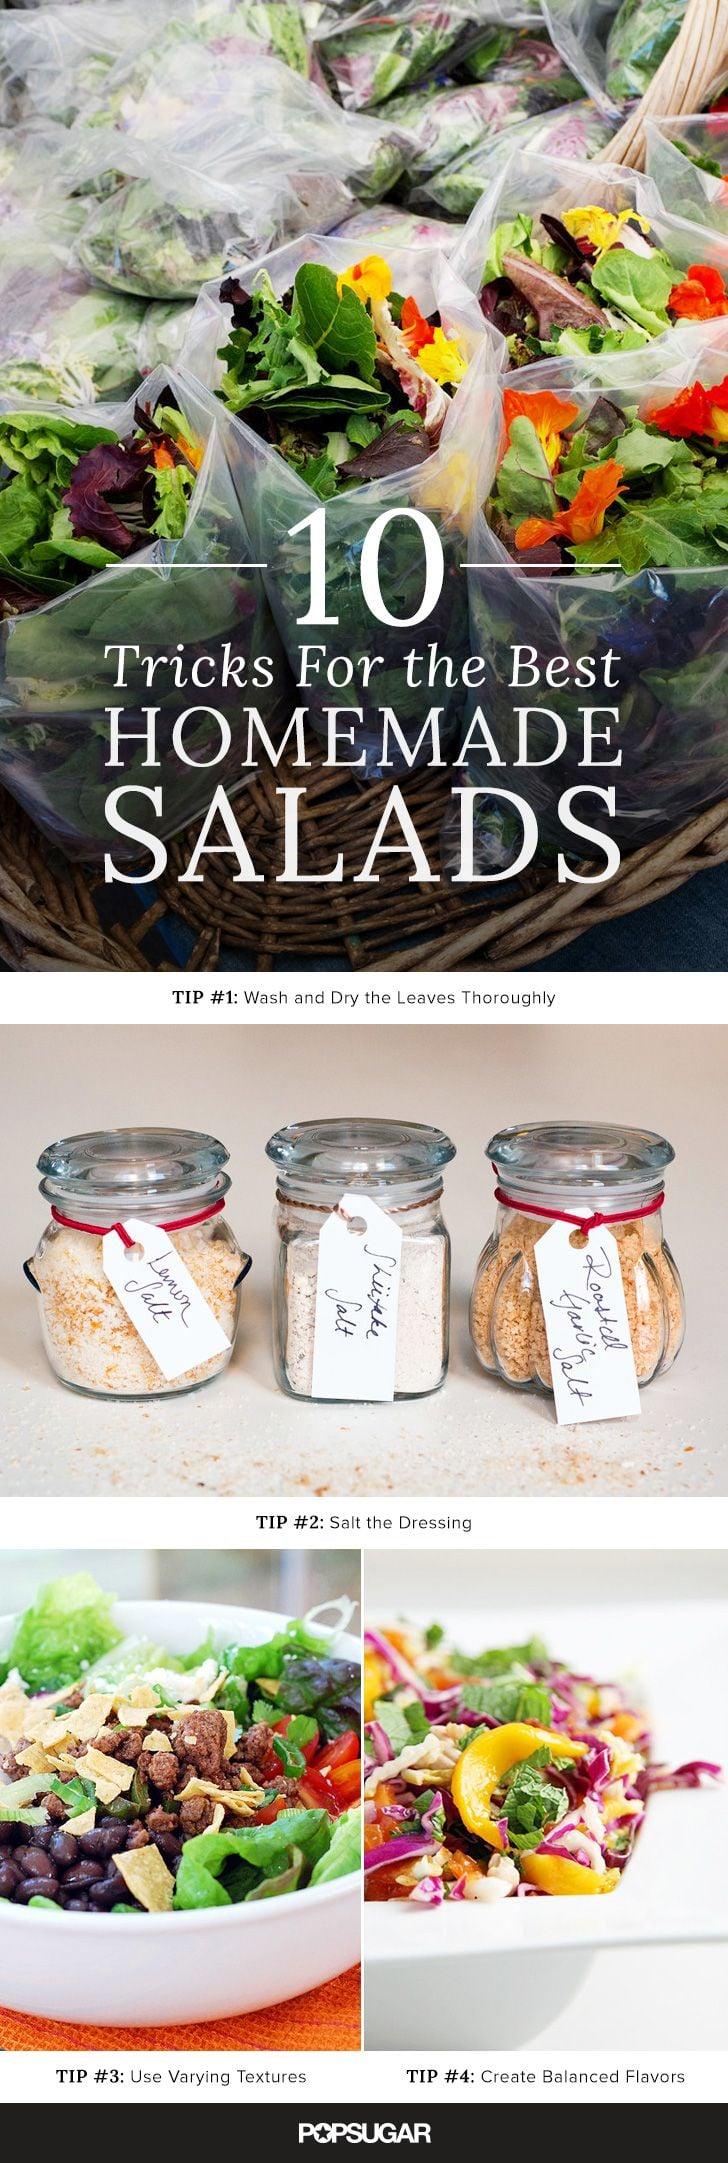 How to Make a Really Good Salad